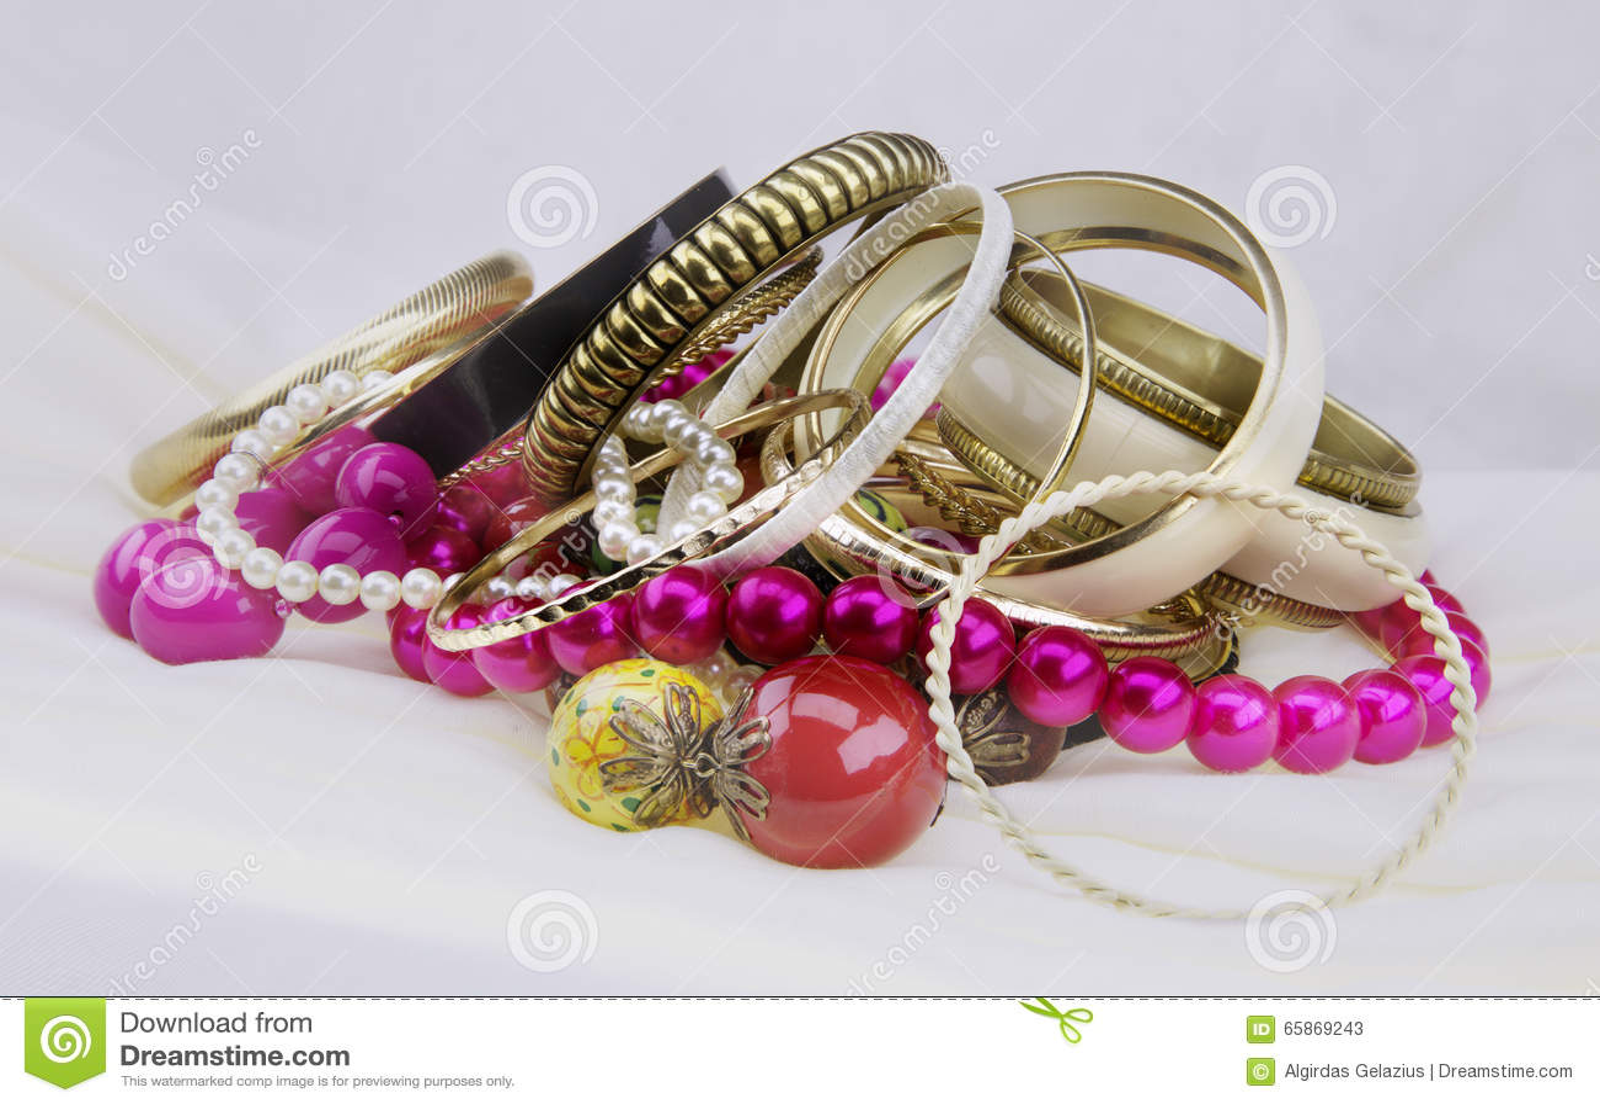 Golden bracelets and beads